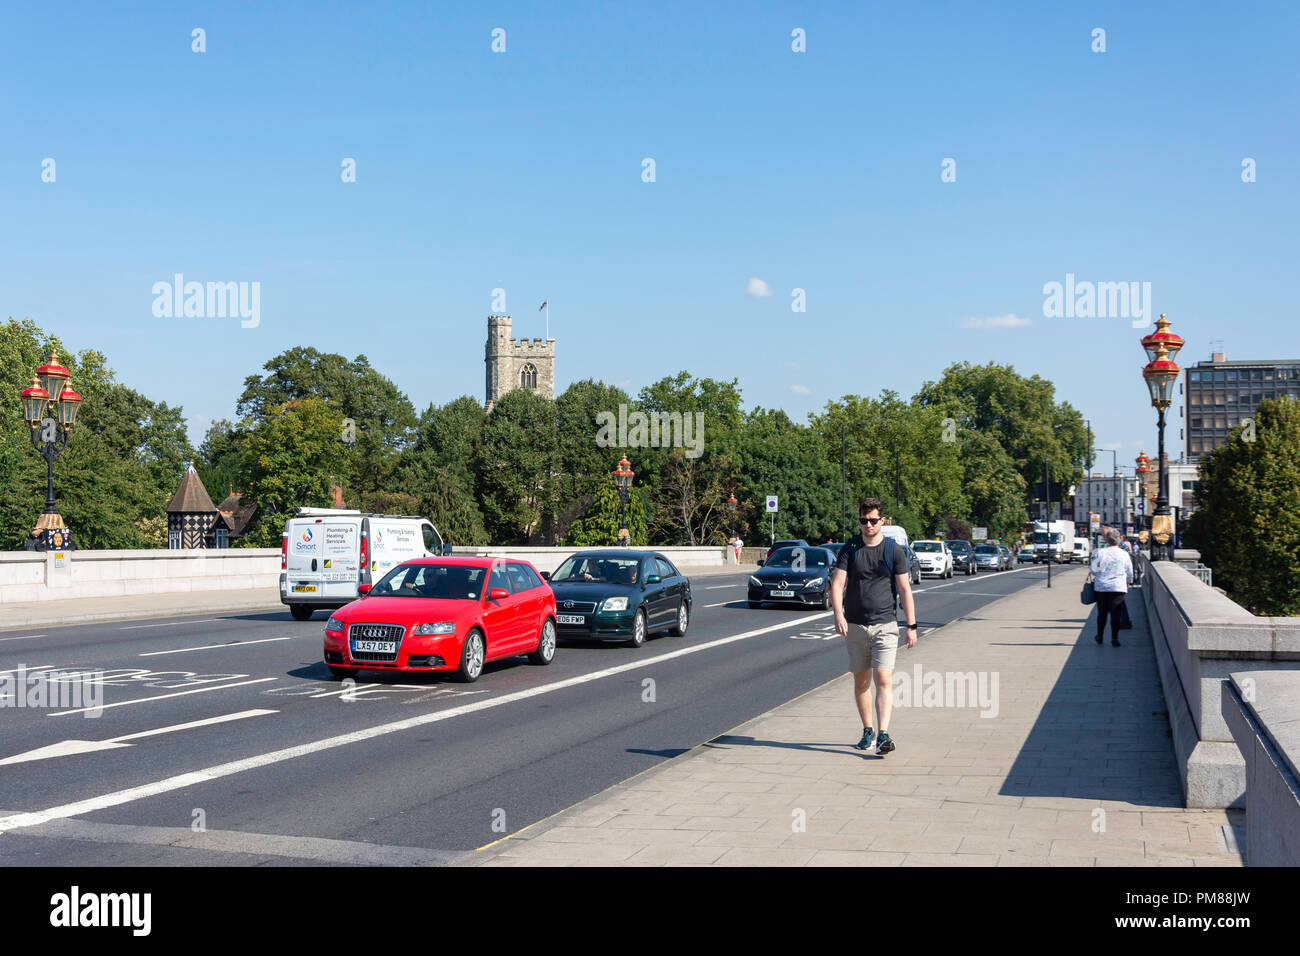 Putney Bridge Approach, Putney, London Borough of Wandsworth, Greater London, England, Regno Unito Immagini Stock